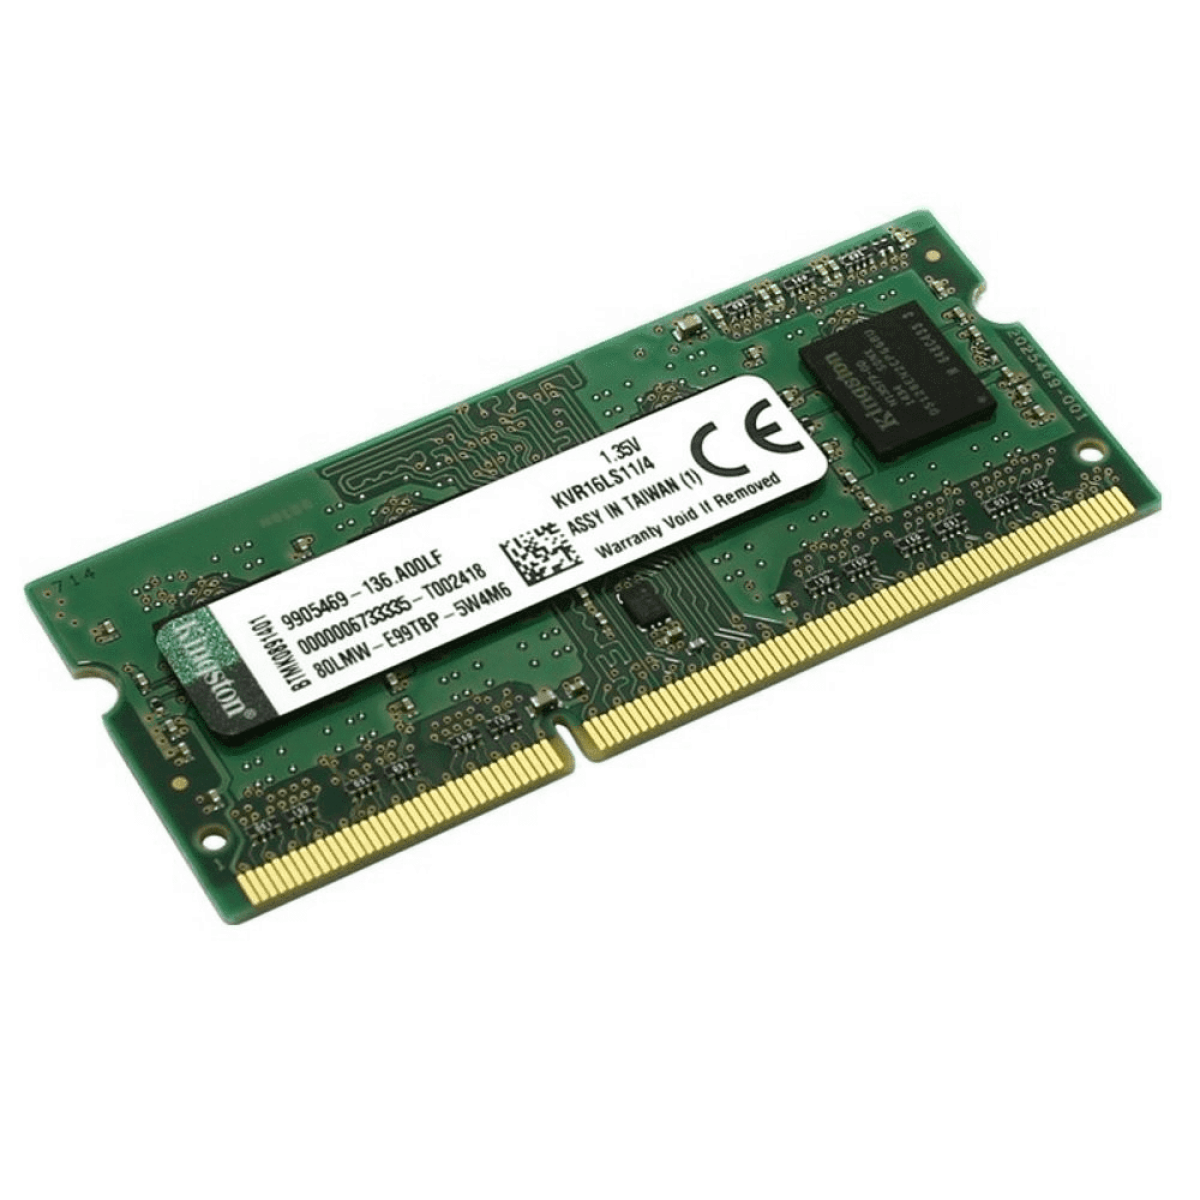 Memória DDR3 P/ Notebook Kingston, 4GB 1600Mhz, KVR16LS11/4